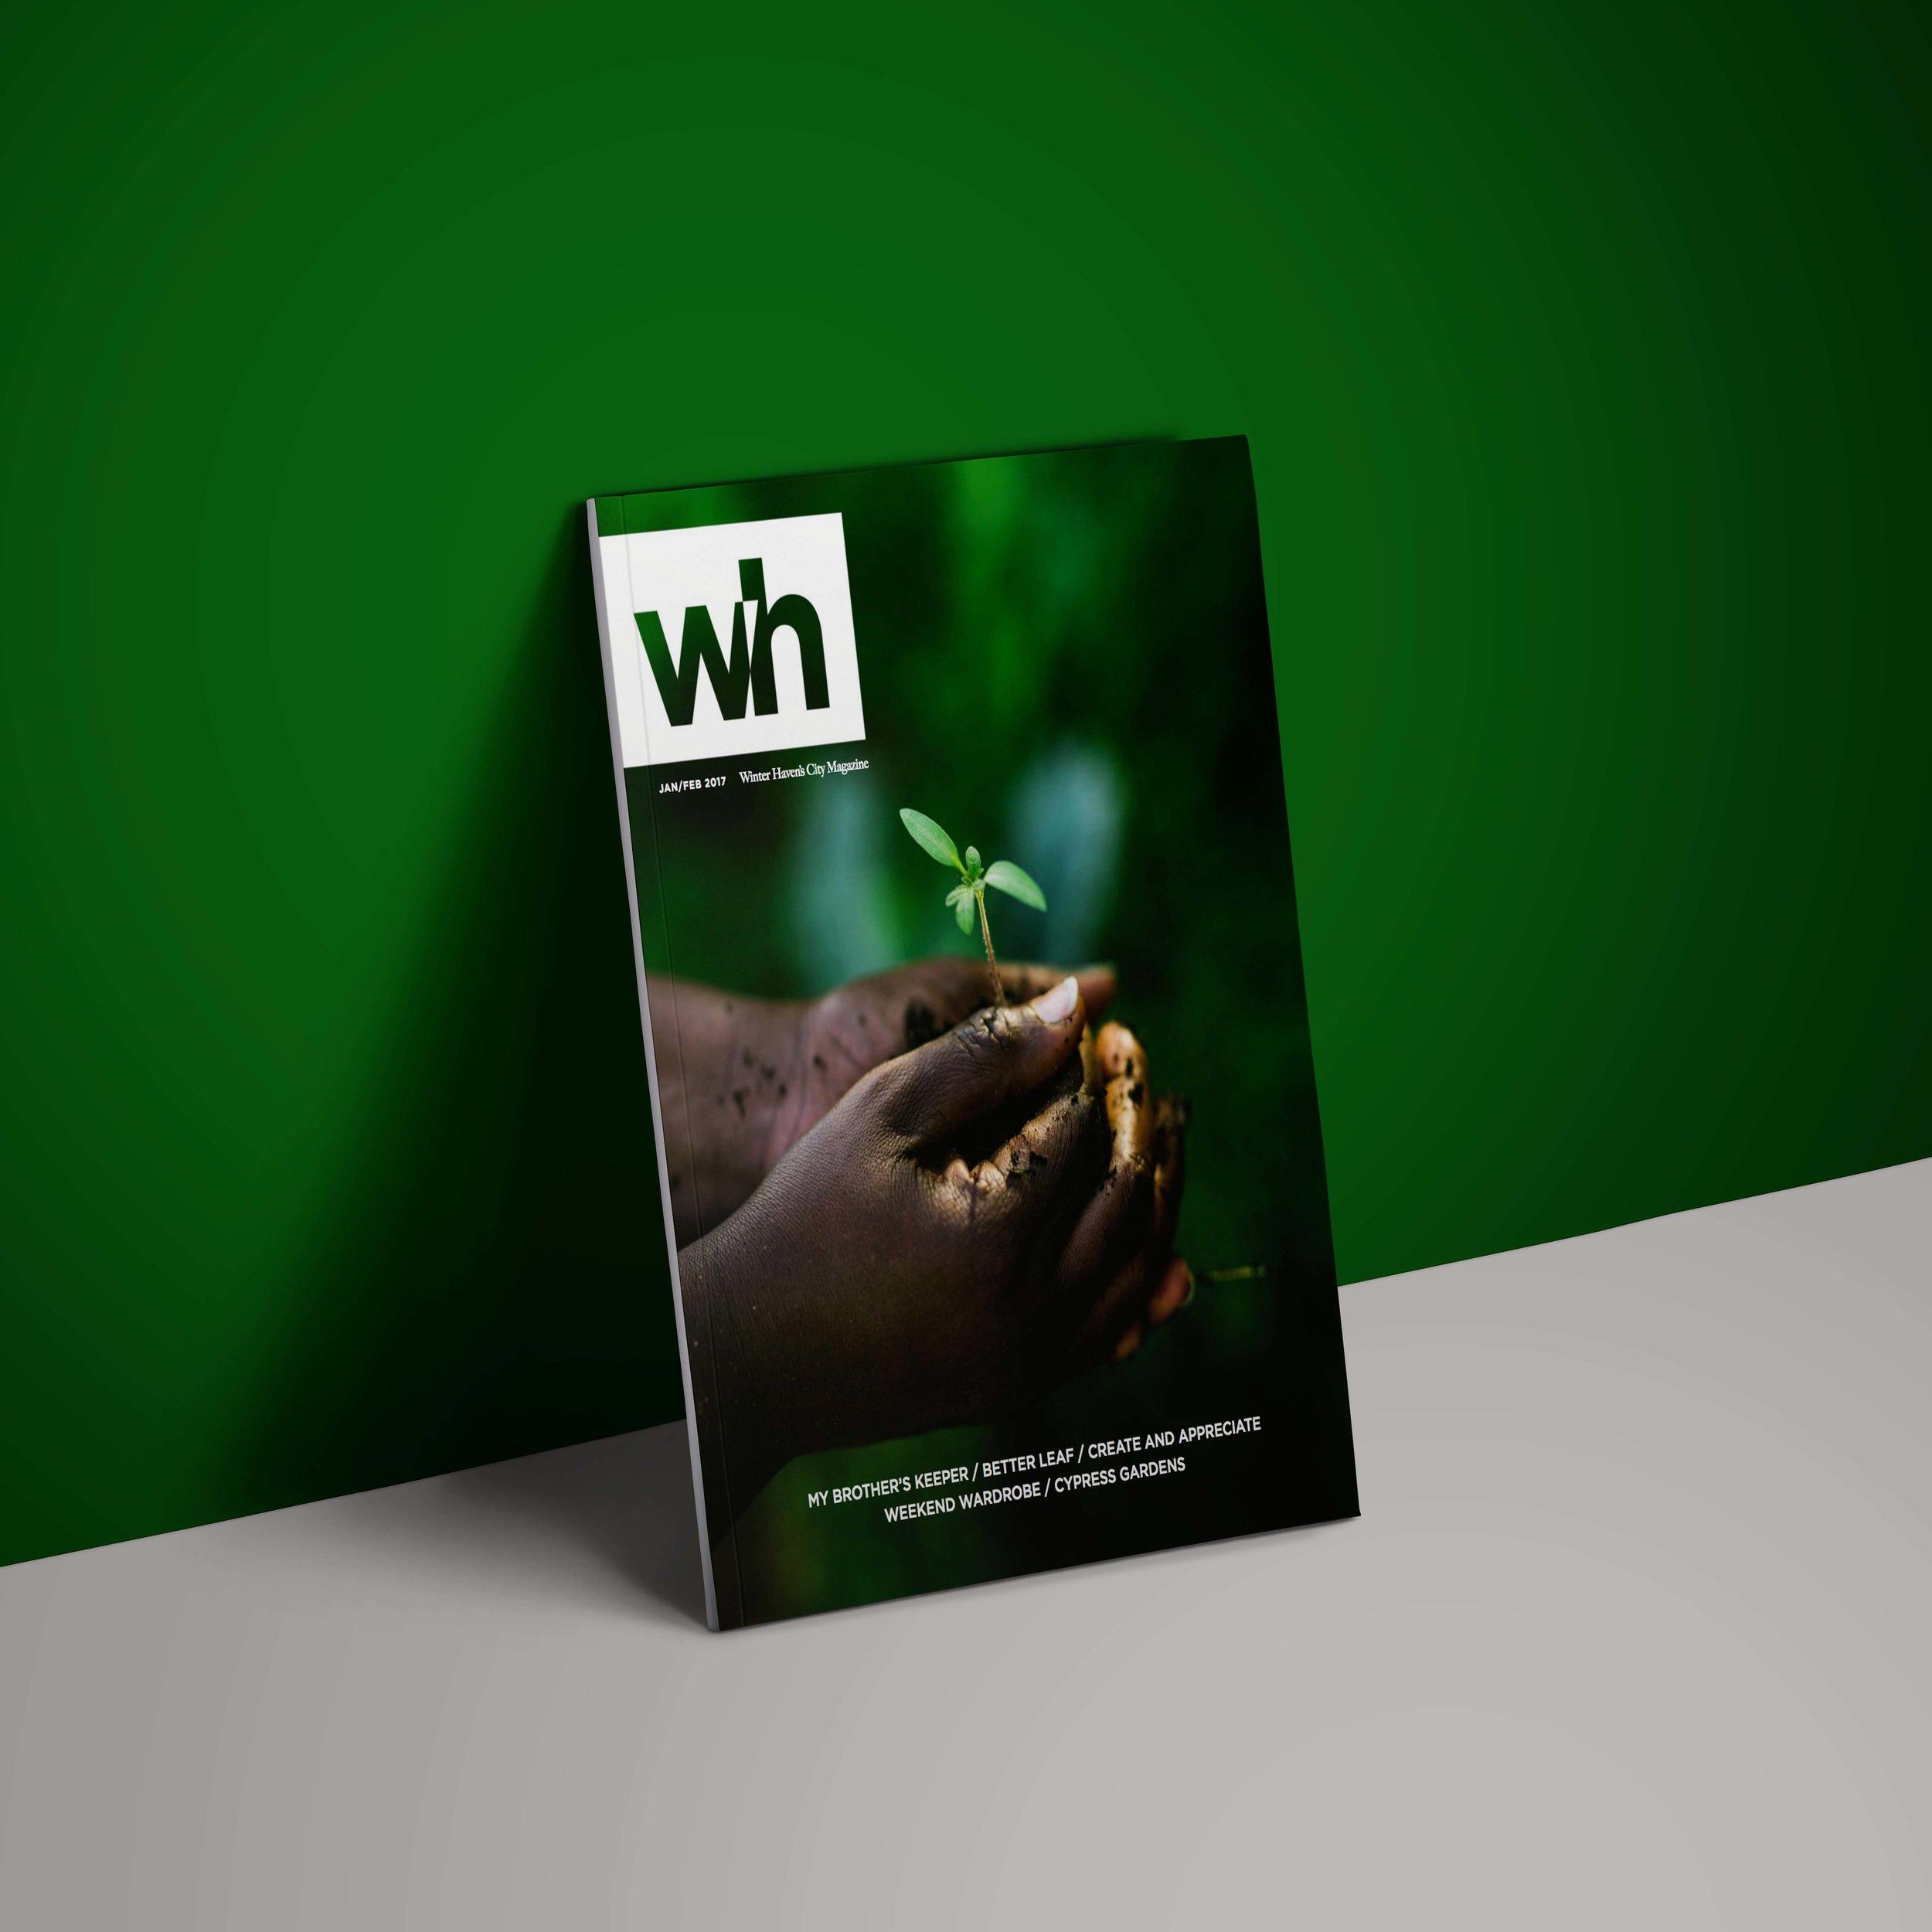 Magazine-Cover-Mockup-Presentation green and gray.jpg